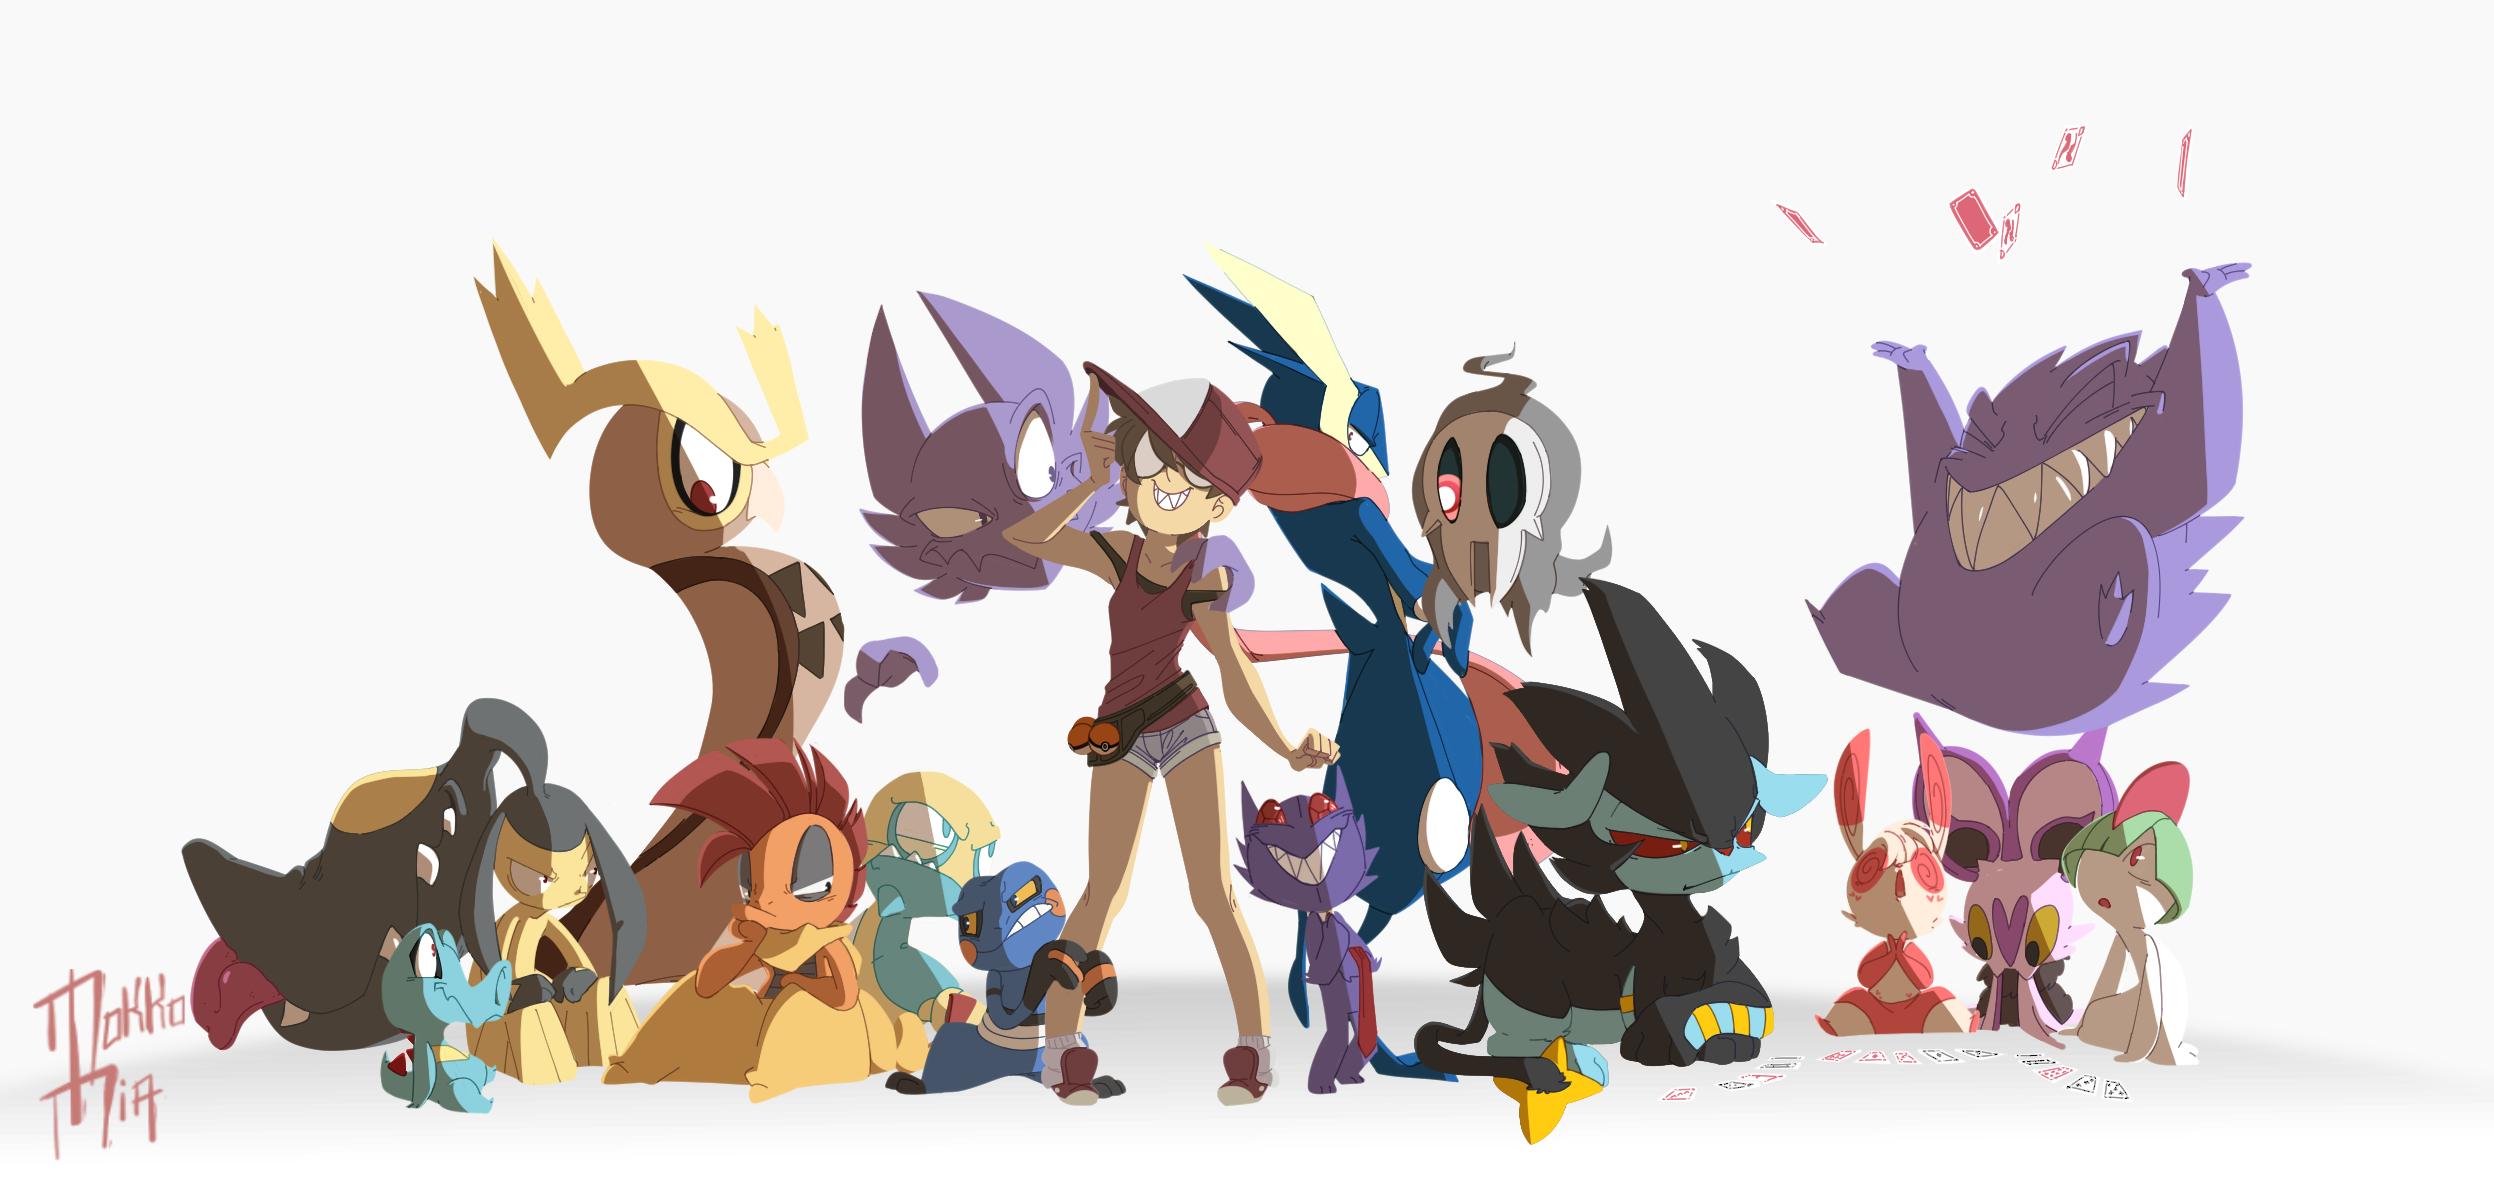 Favs Pokemons